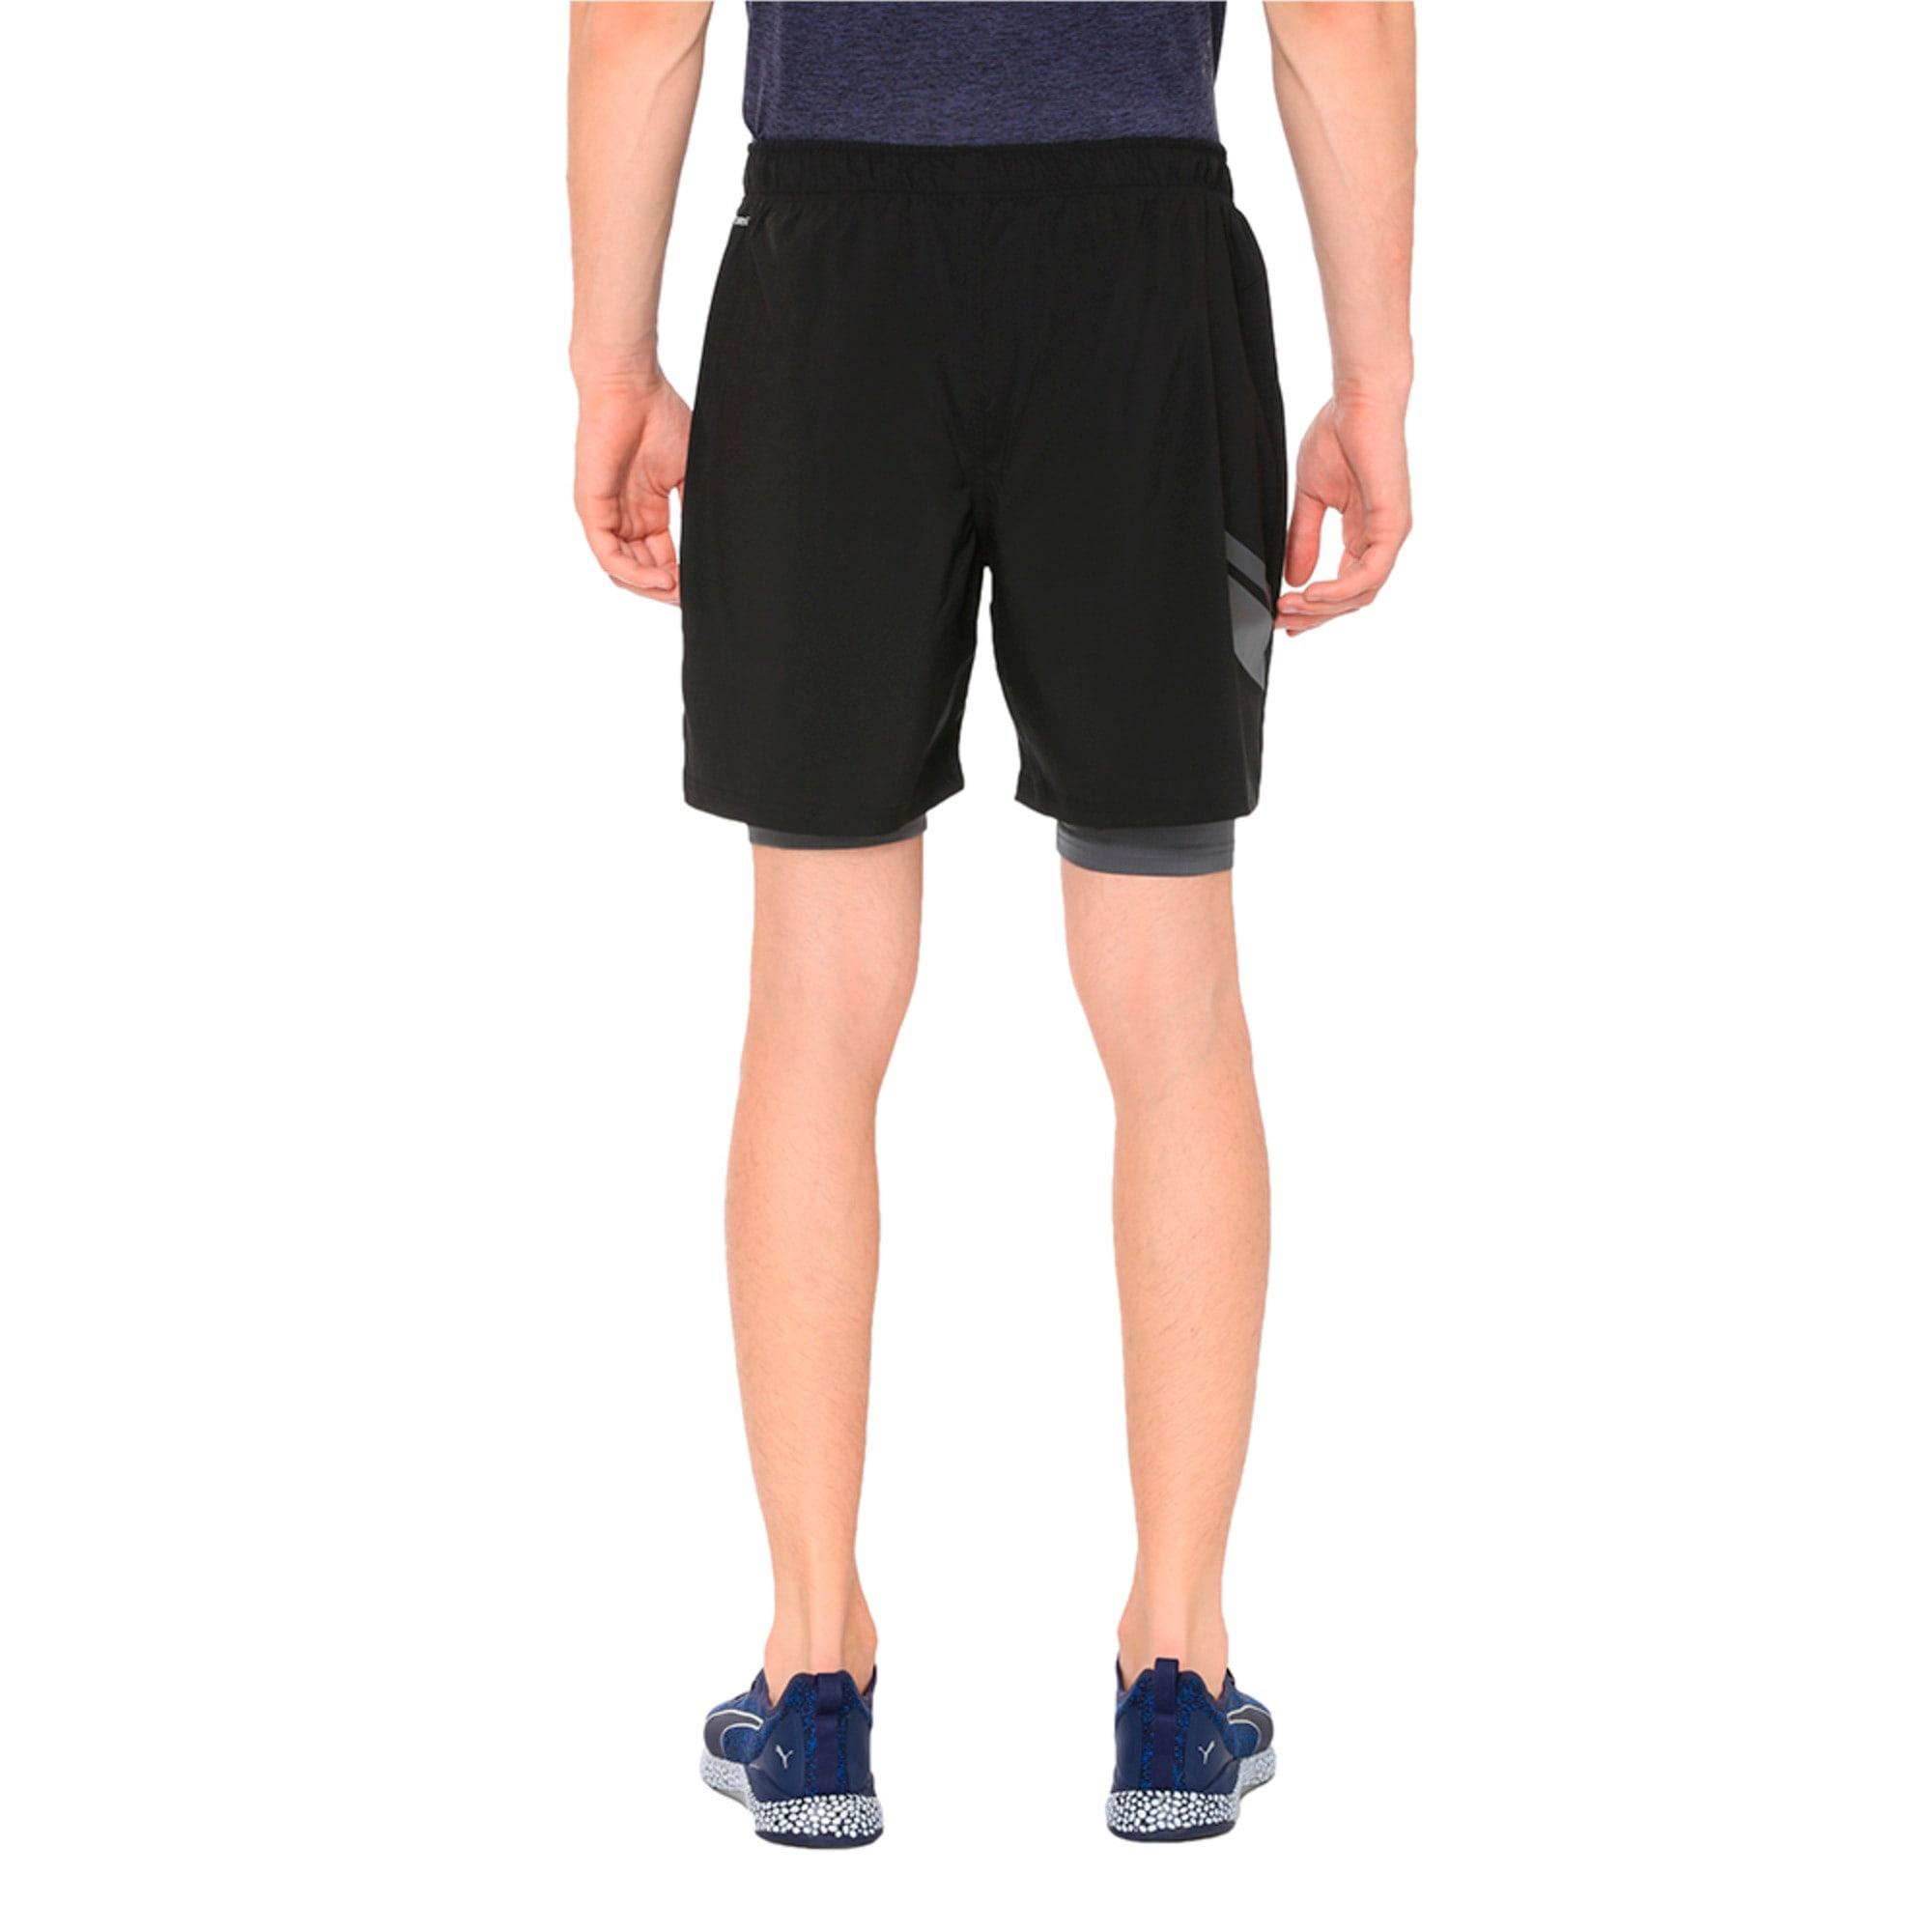 Thumbnail 2 of Running Men's IGNITE 2-in-1 Shorts, Puma Black, medium-IND